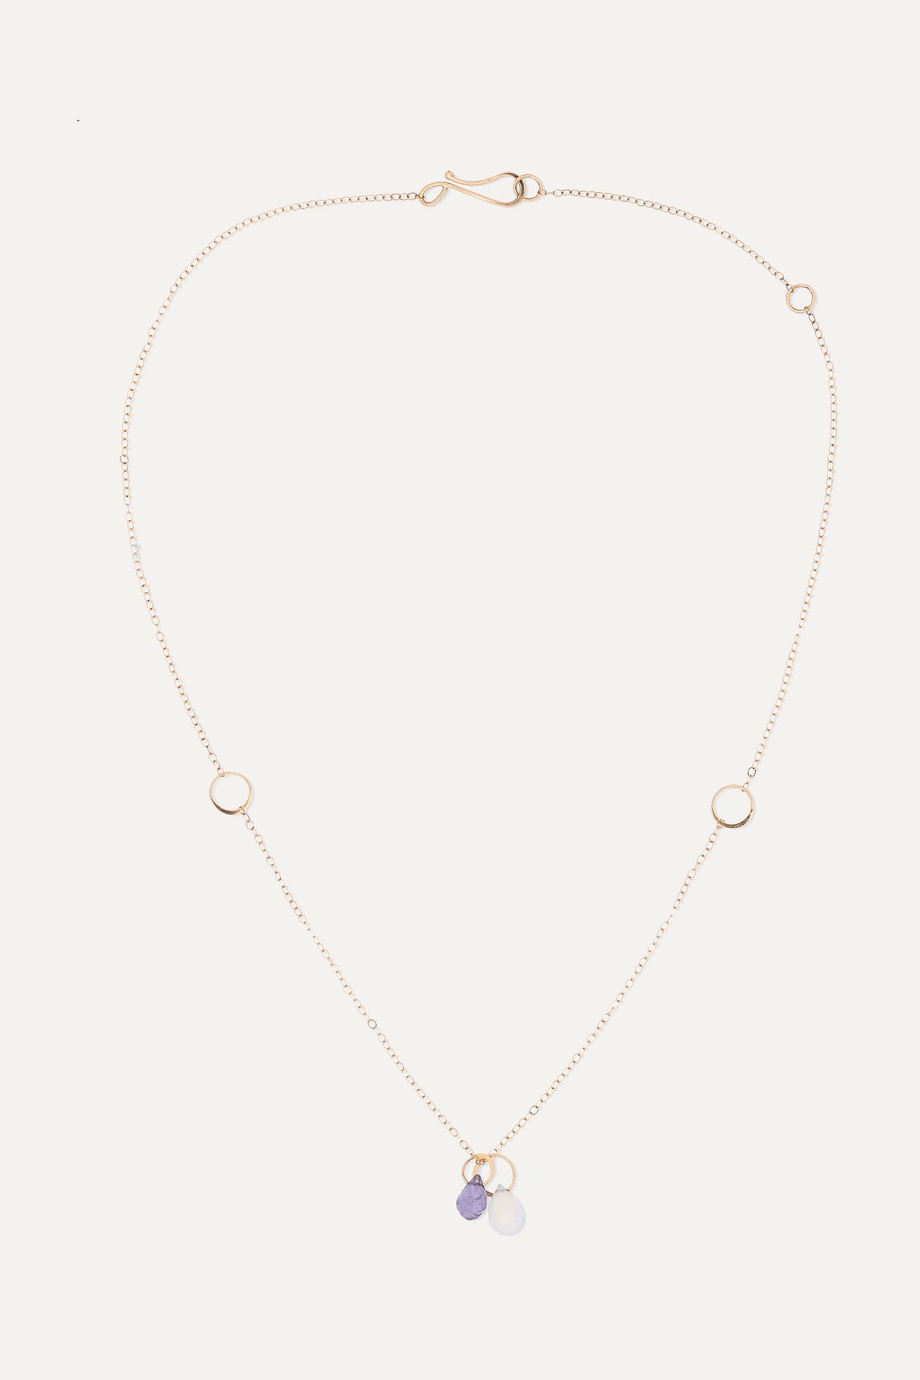 Melissa Joy Manning + NET SUSTAIN 14-karat gold, chalcedony and iolite necklace